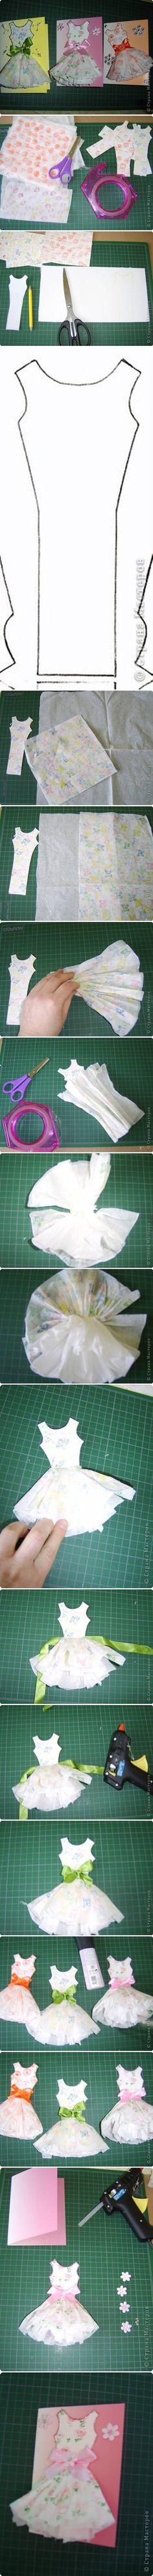 DIY Paper Dress Card Topper dress paper diy easy crafts